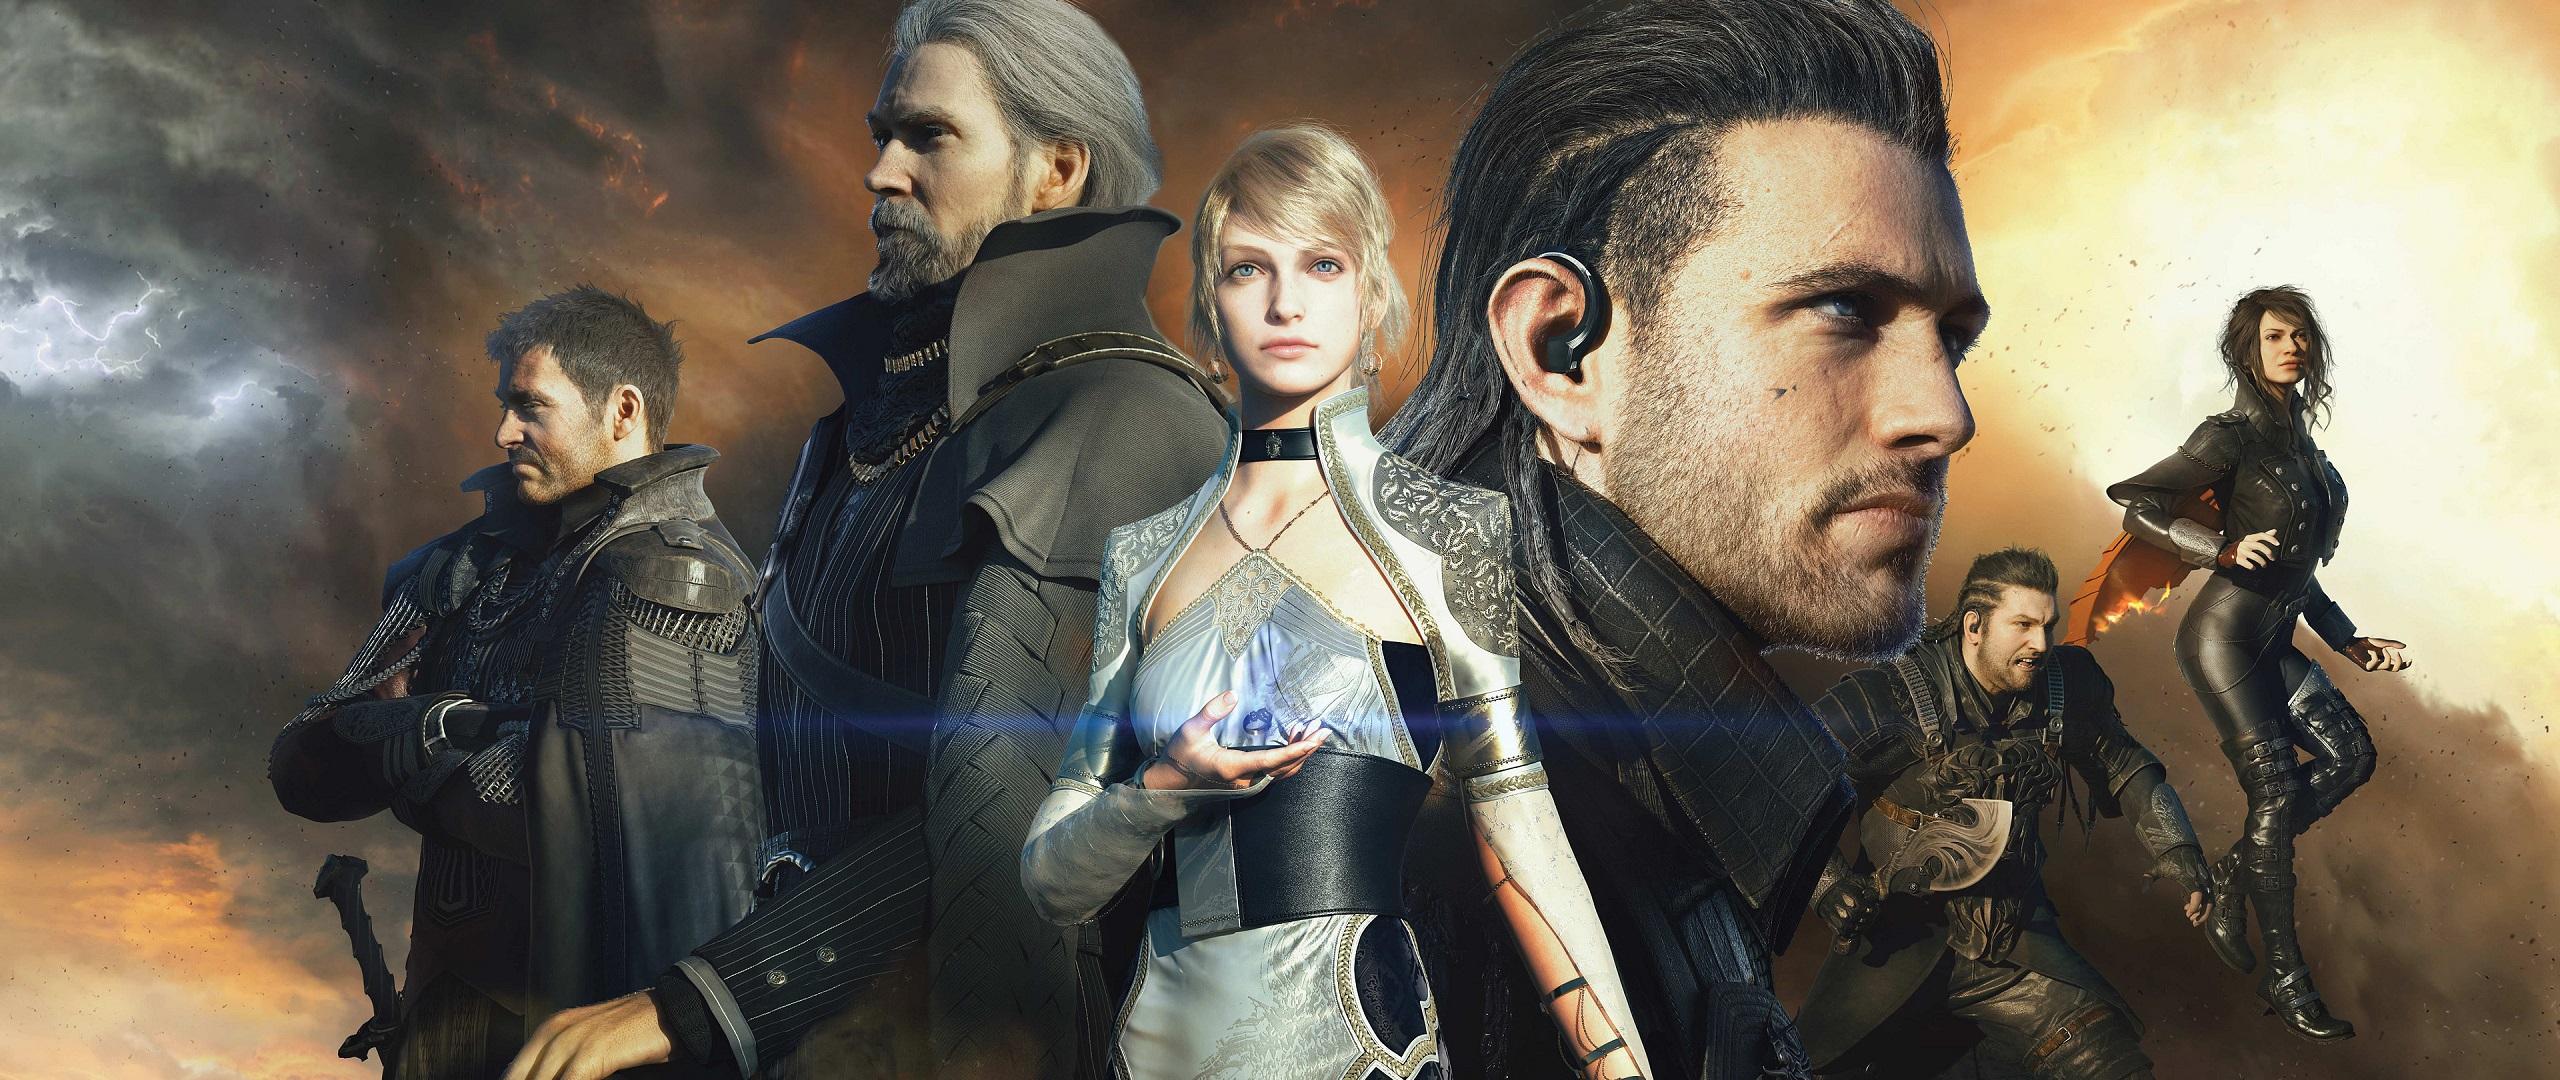 2560x1080 Luna Final Fantasy Xv 4k 2560x1080 Resolution Hd: Kingsglaive Final Fantasy XV HD Wallpaper